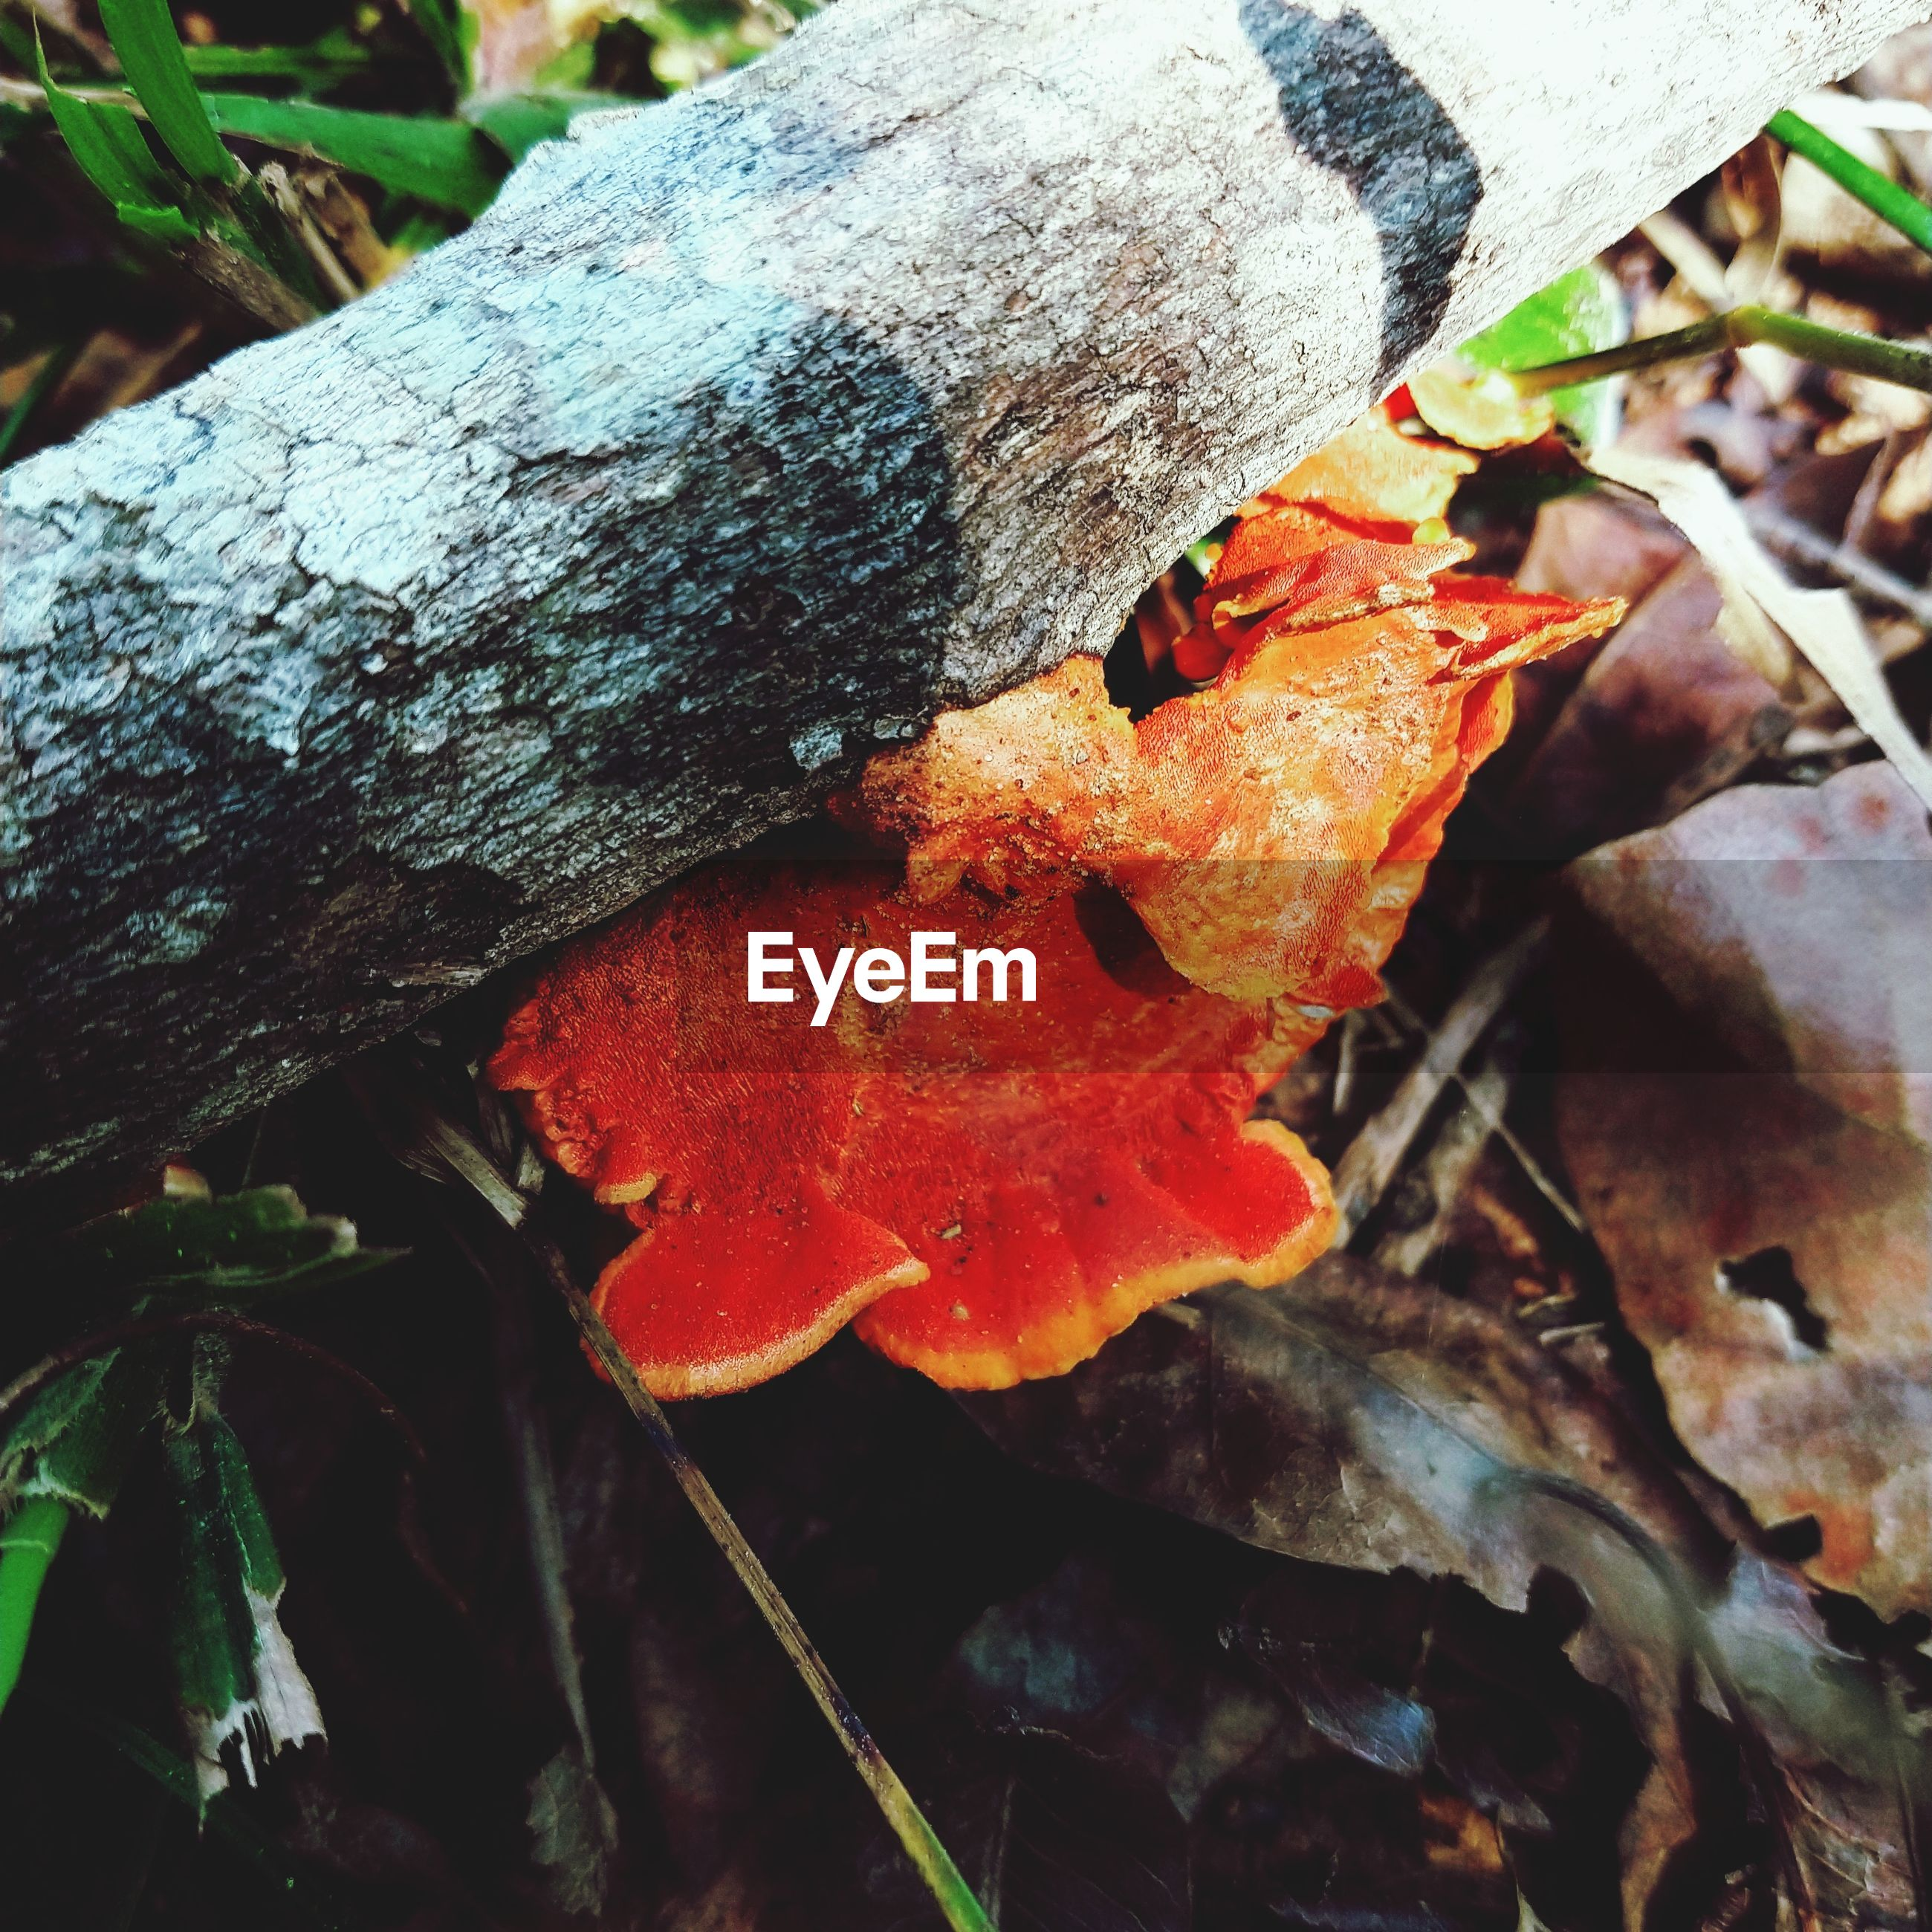 CLOSE-UP OF ORANGE MUSHROOM GROWING ON TREE TRUNK